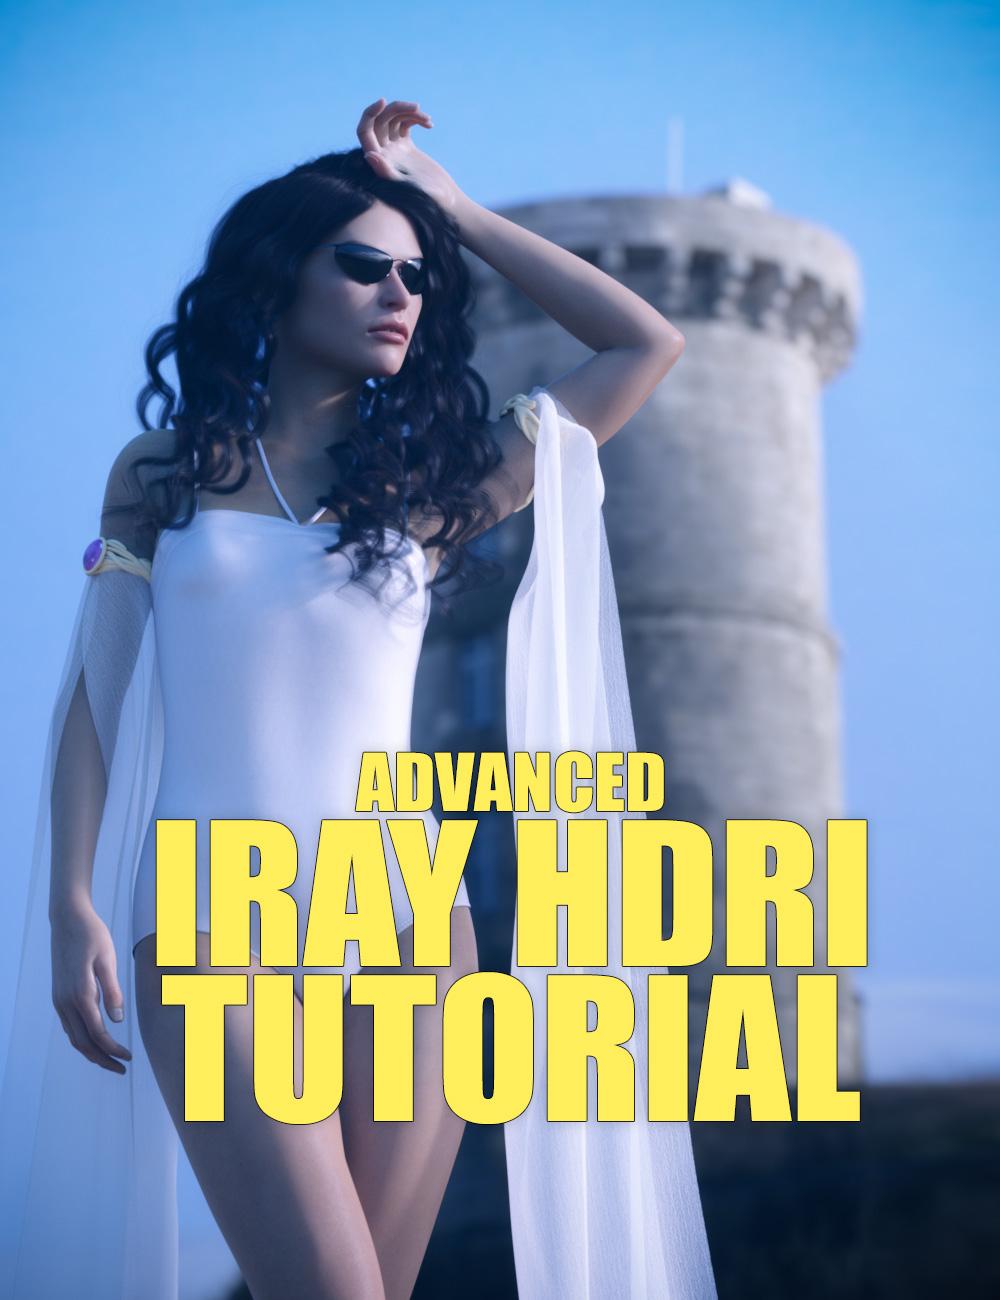 Advanced Iray HDRI Tricks - Tutorial by: Dreamlight, 3D Models by Daz 3D